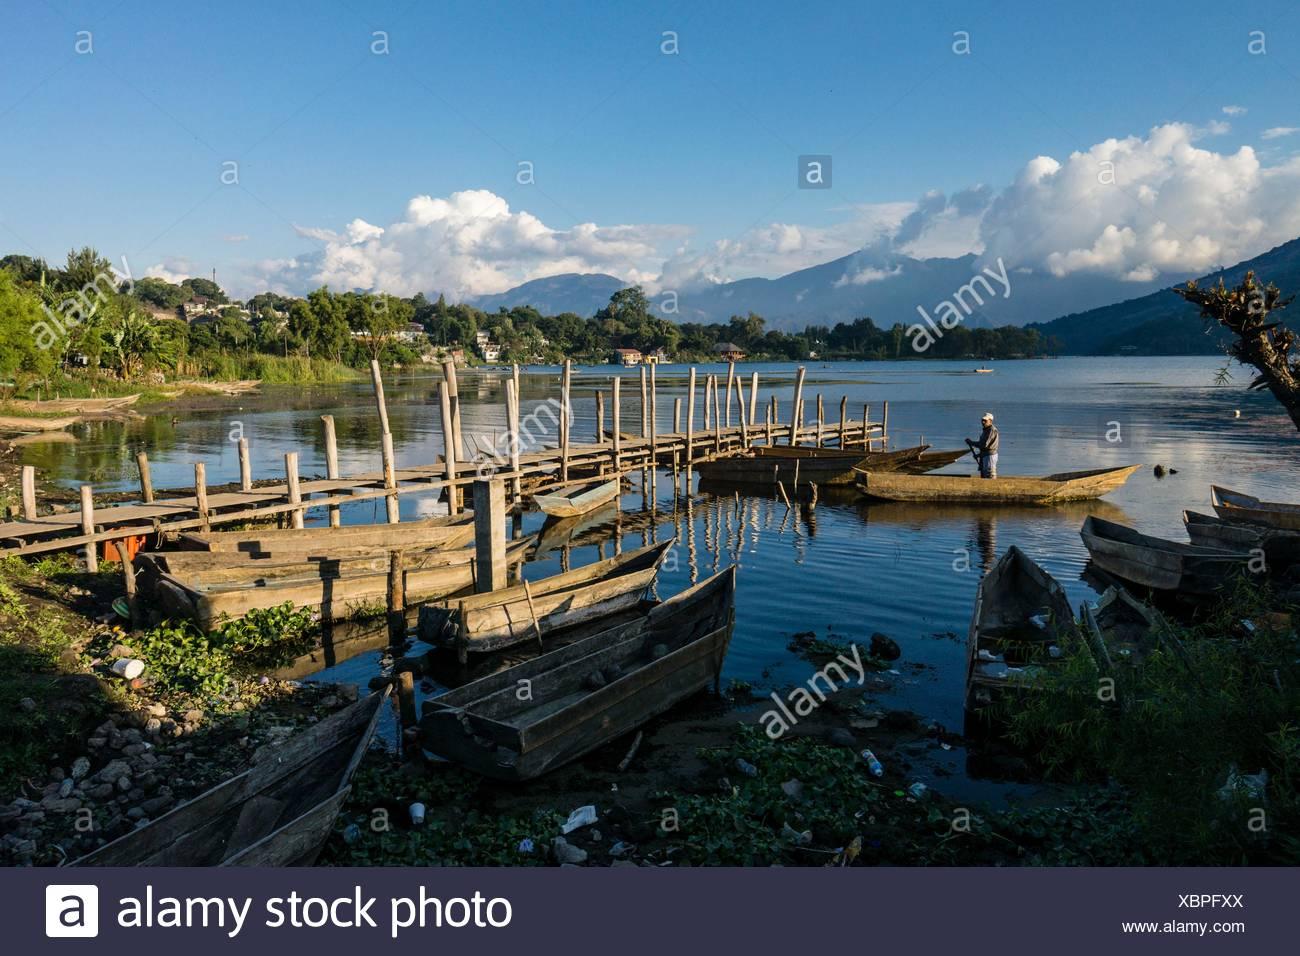 Canoes. Atitlan Lake. San Pedro Volcano. Santiago Atitlan, Solola Department, Guatemala - Stock Image